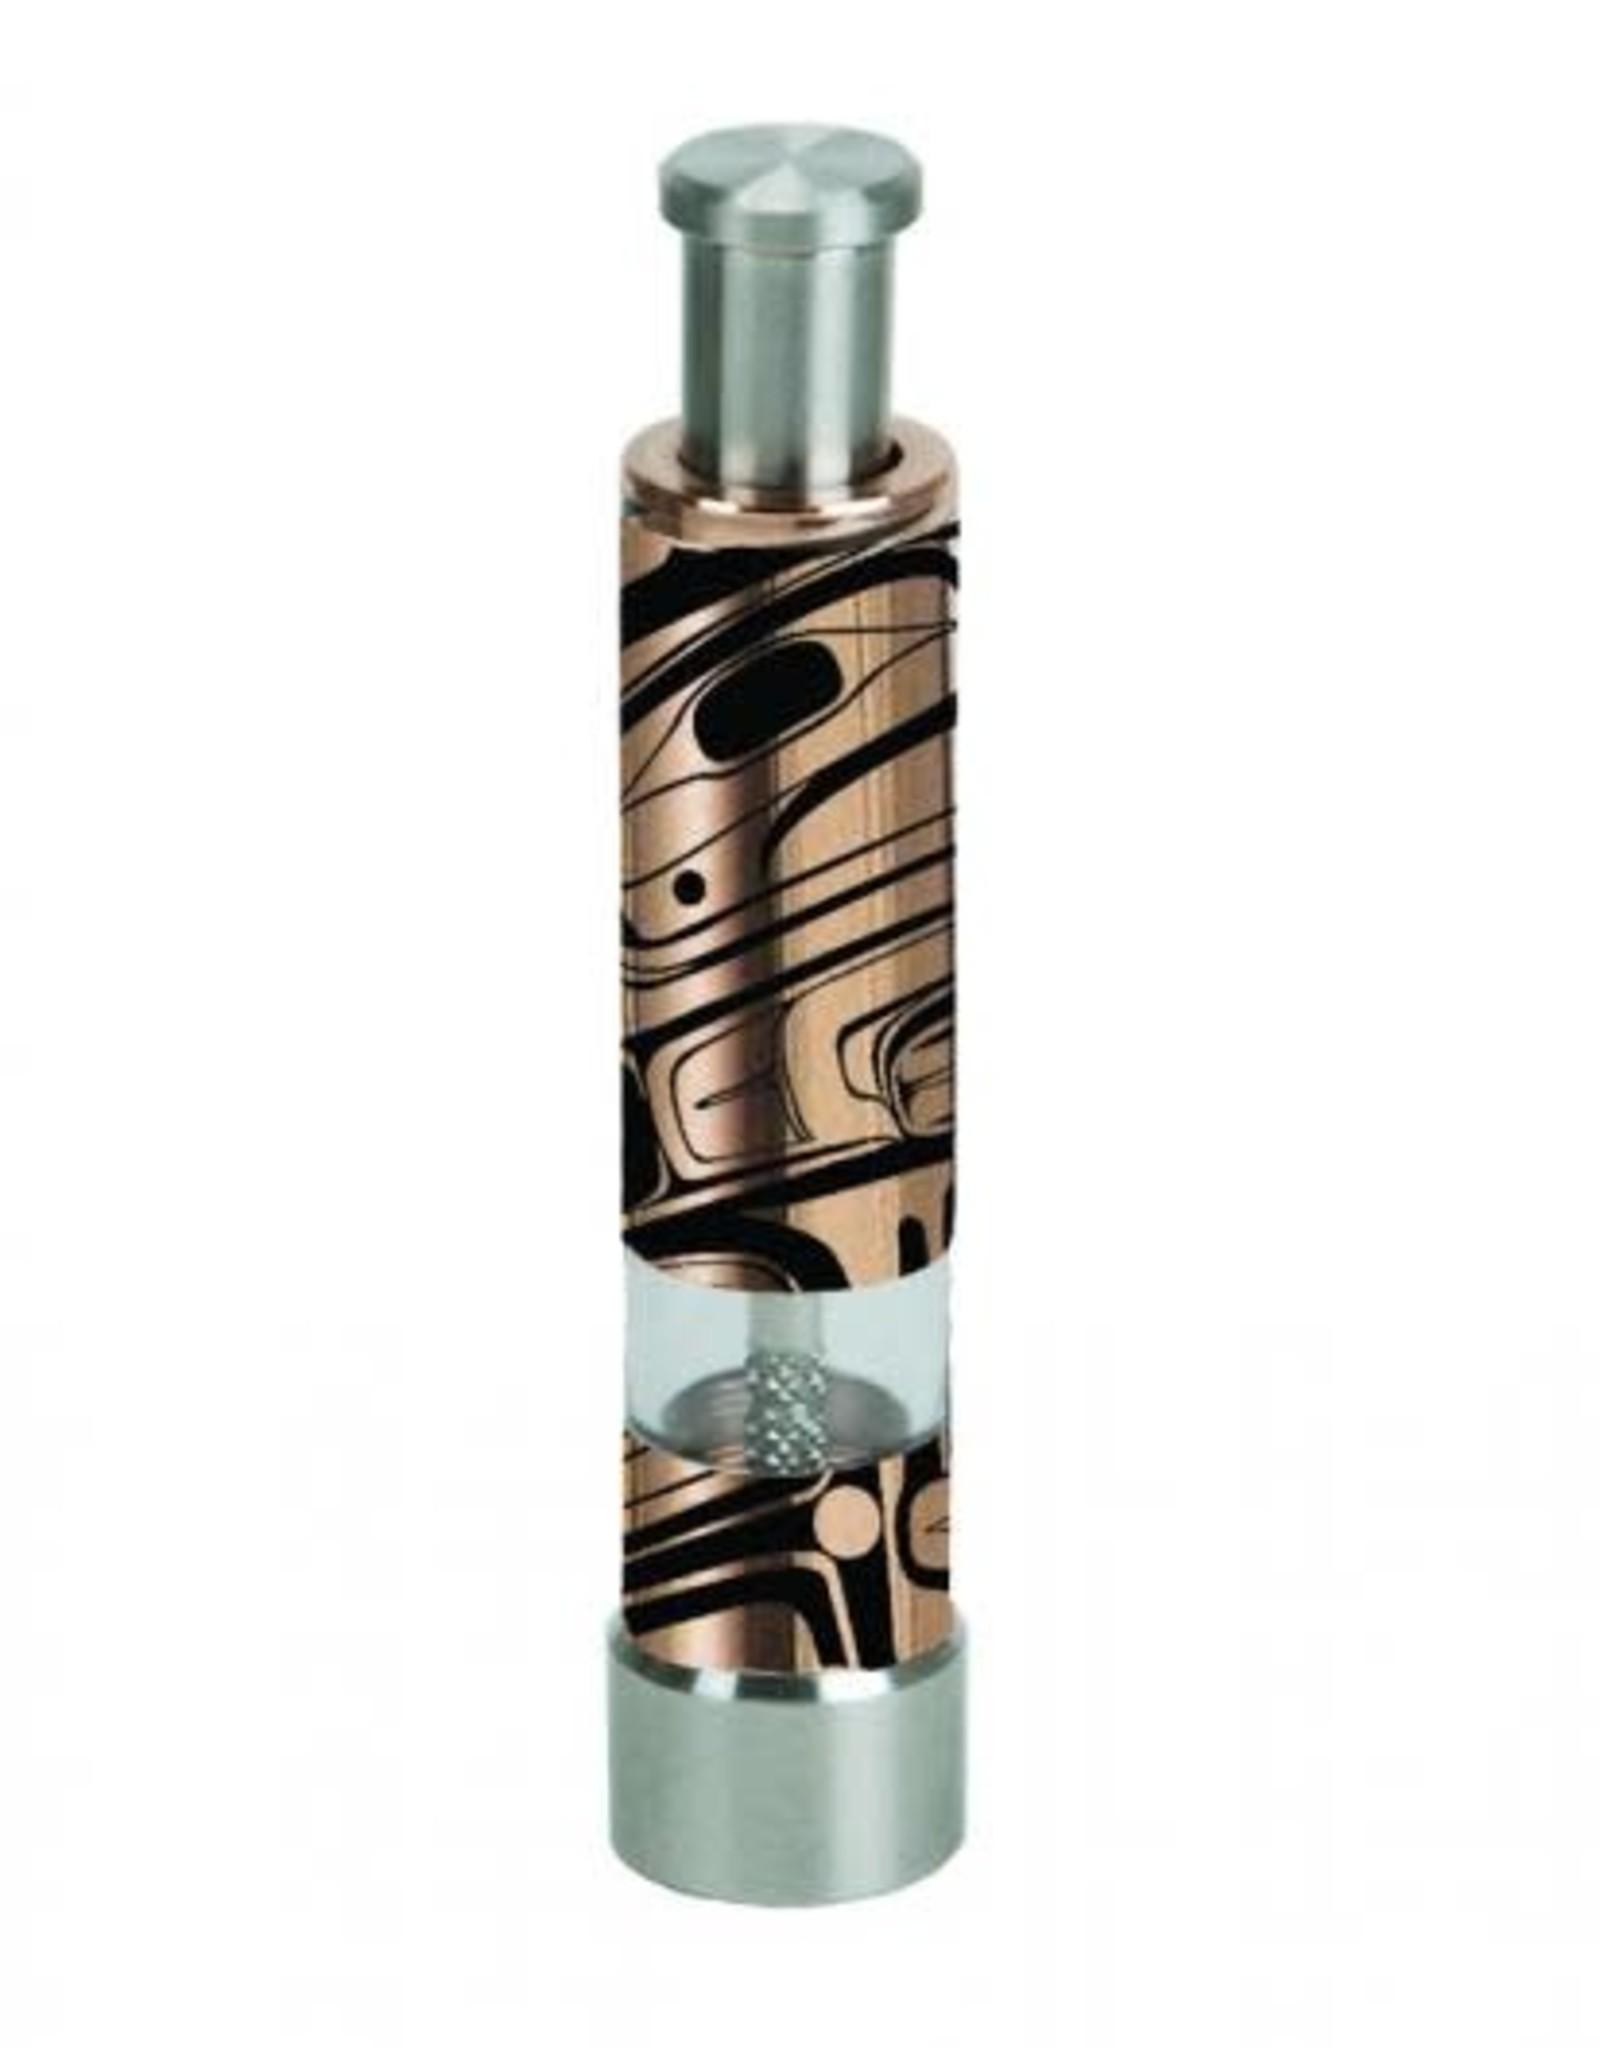 Copper & Stainless Steel Salt/ Pepper Pump-Bear by Marcel Russ